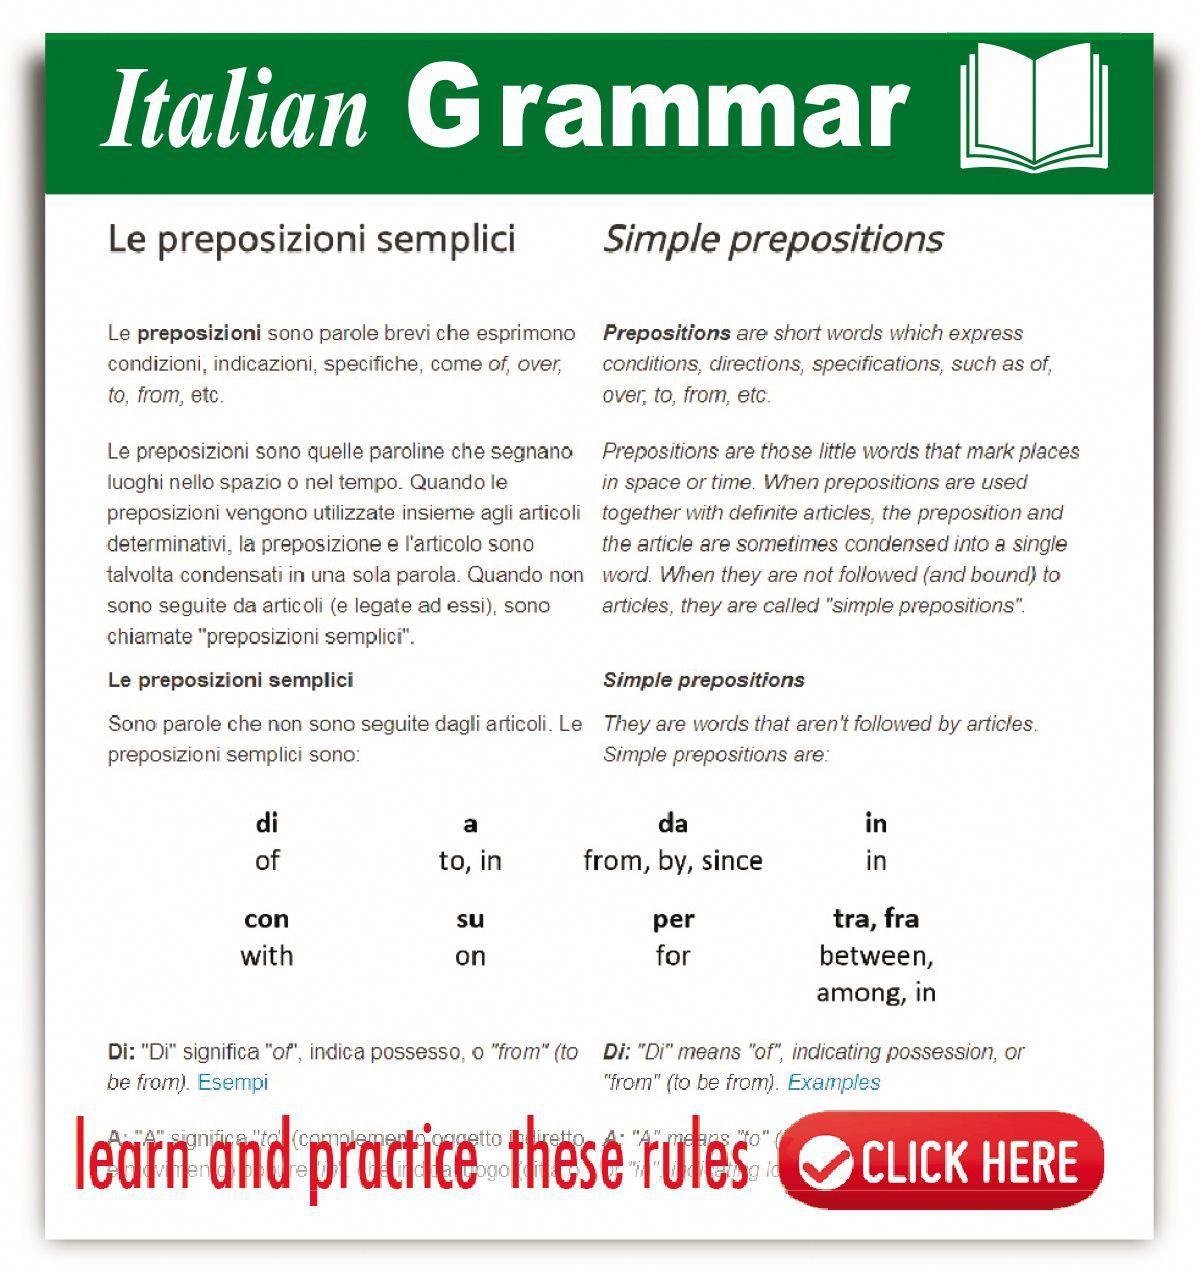 Italian Simple Prepositions